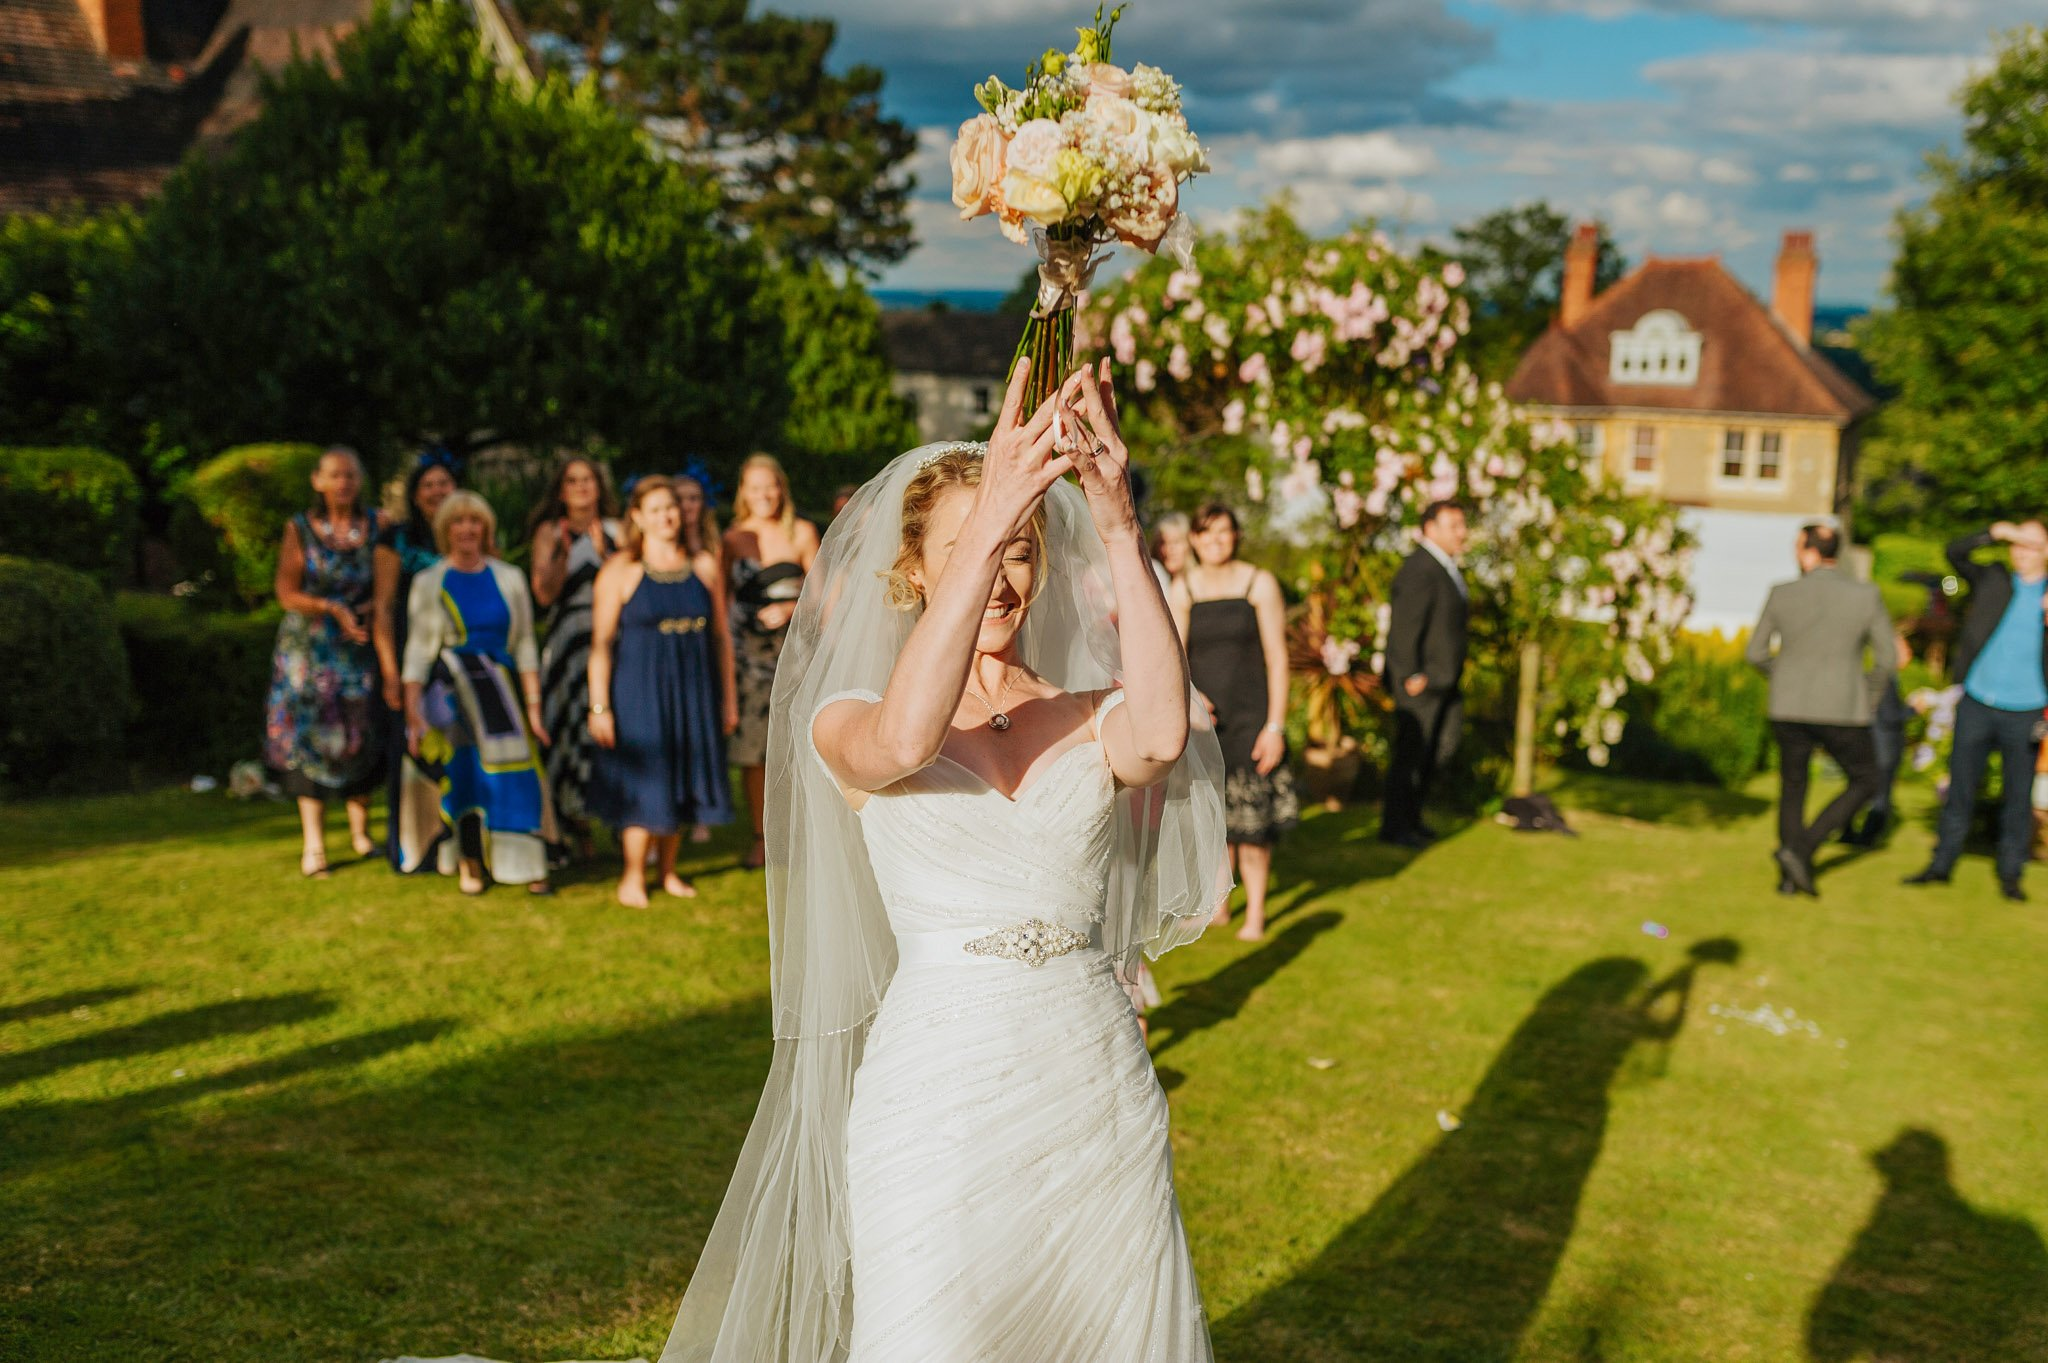 Georgina + Mike - Wedding photography in Malvern, Worcestershire 69